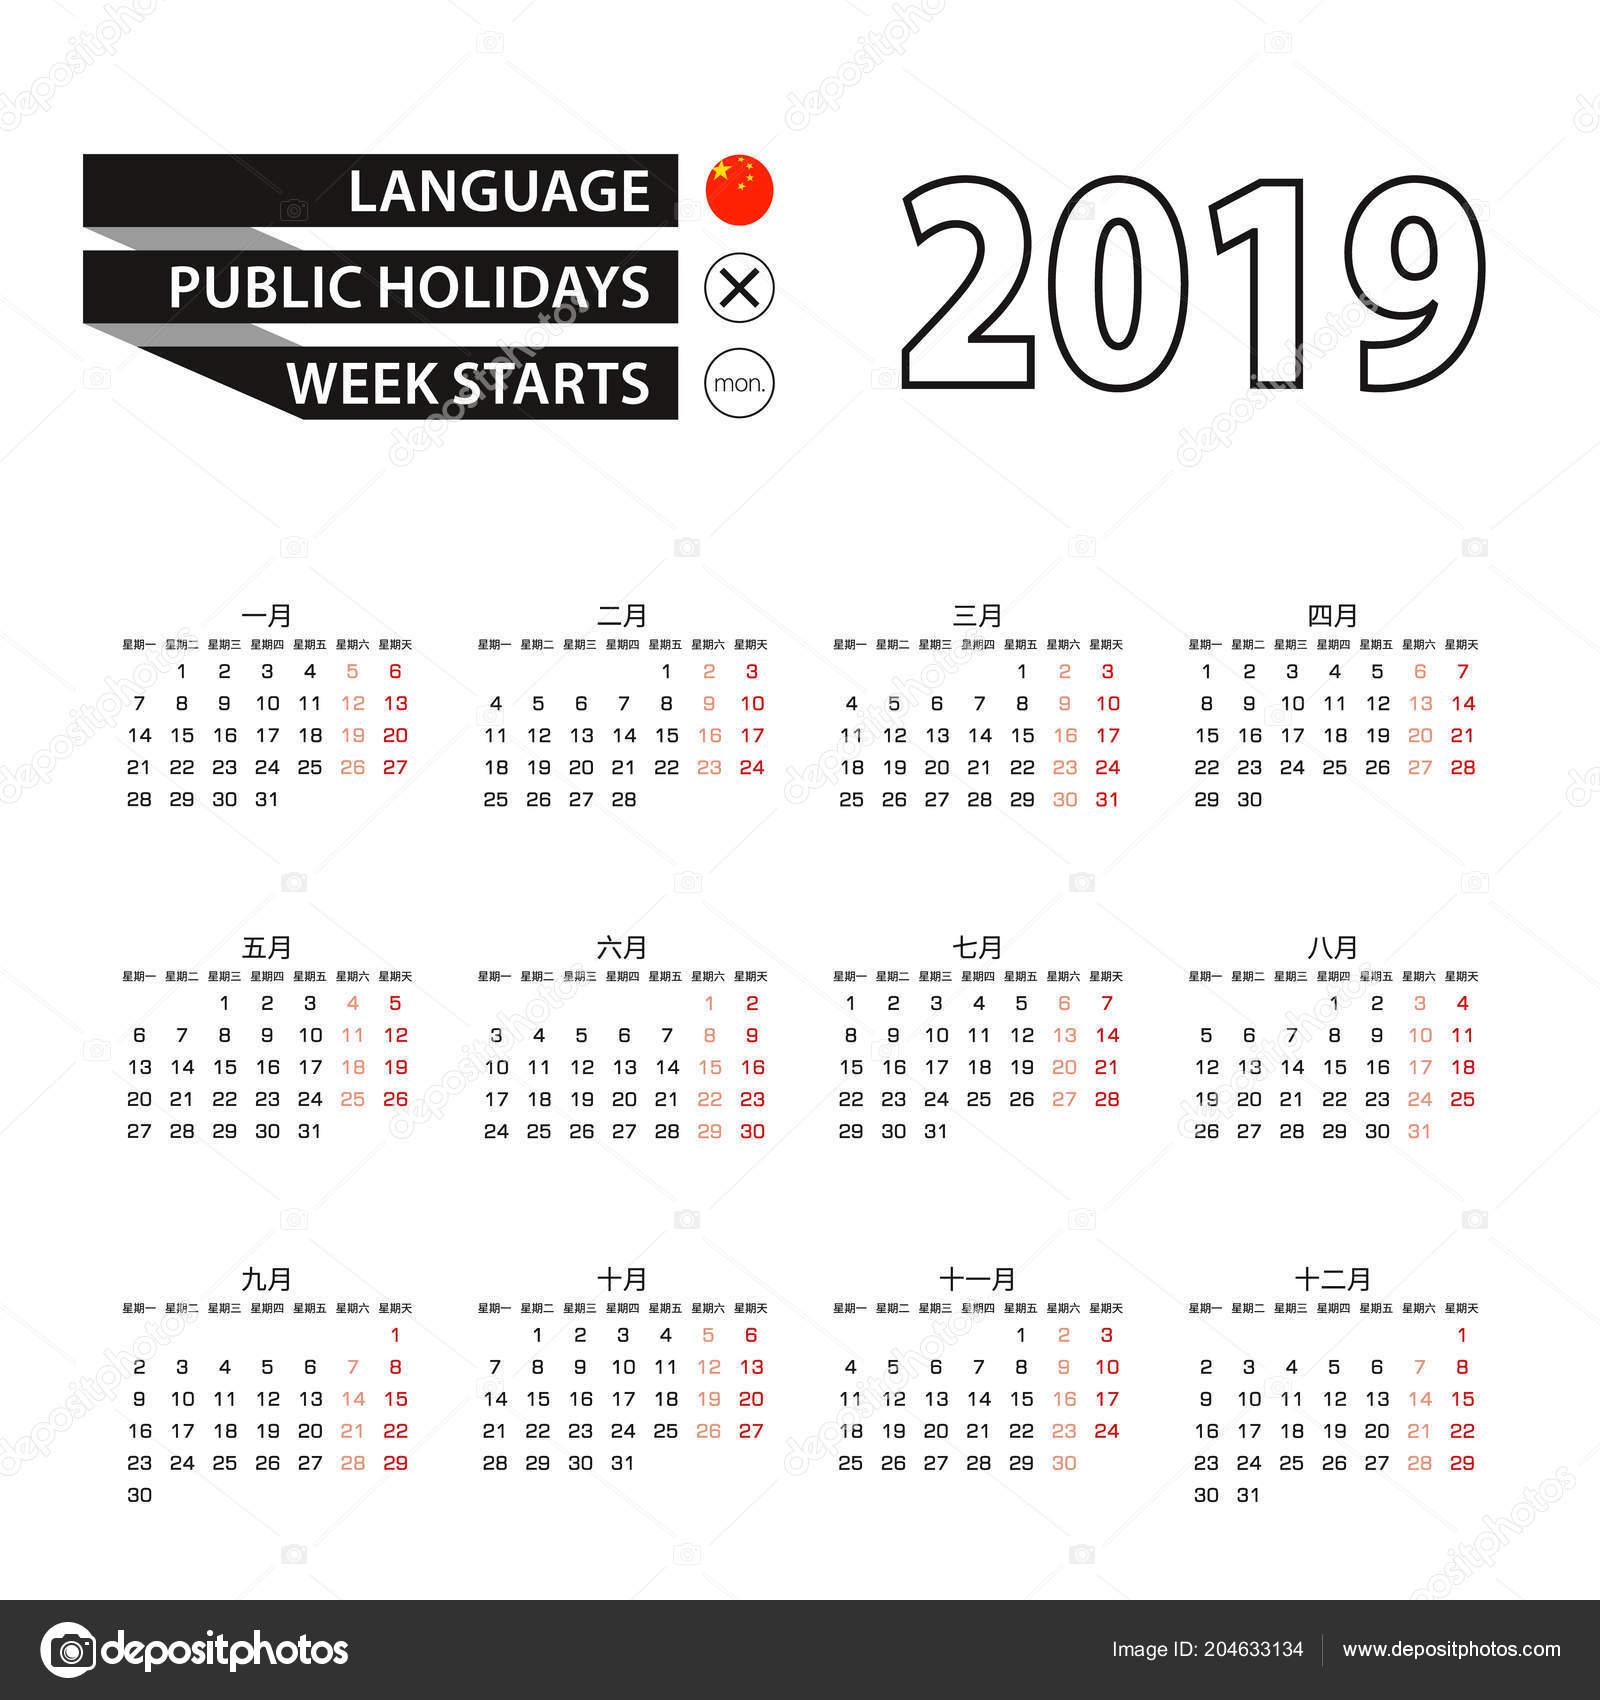 Calendar 2019 Chinese Language Week Starts Monday Vector